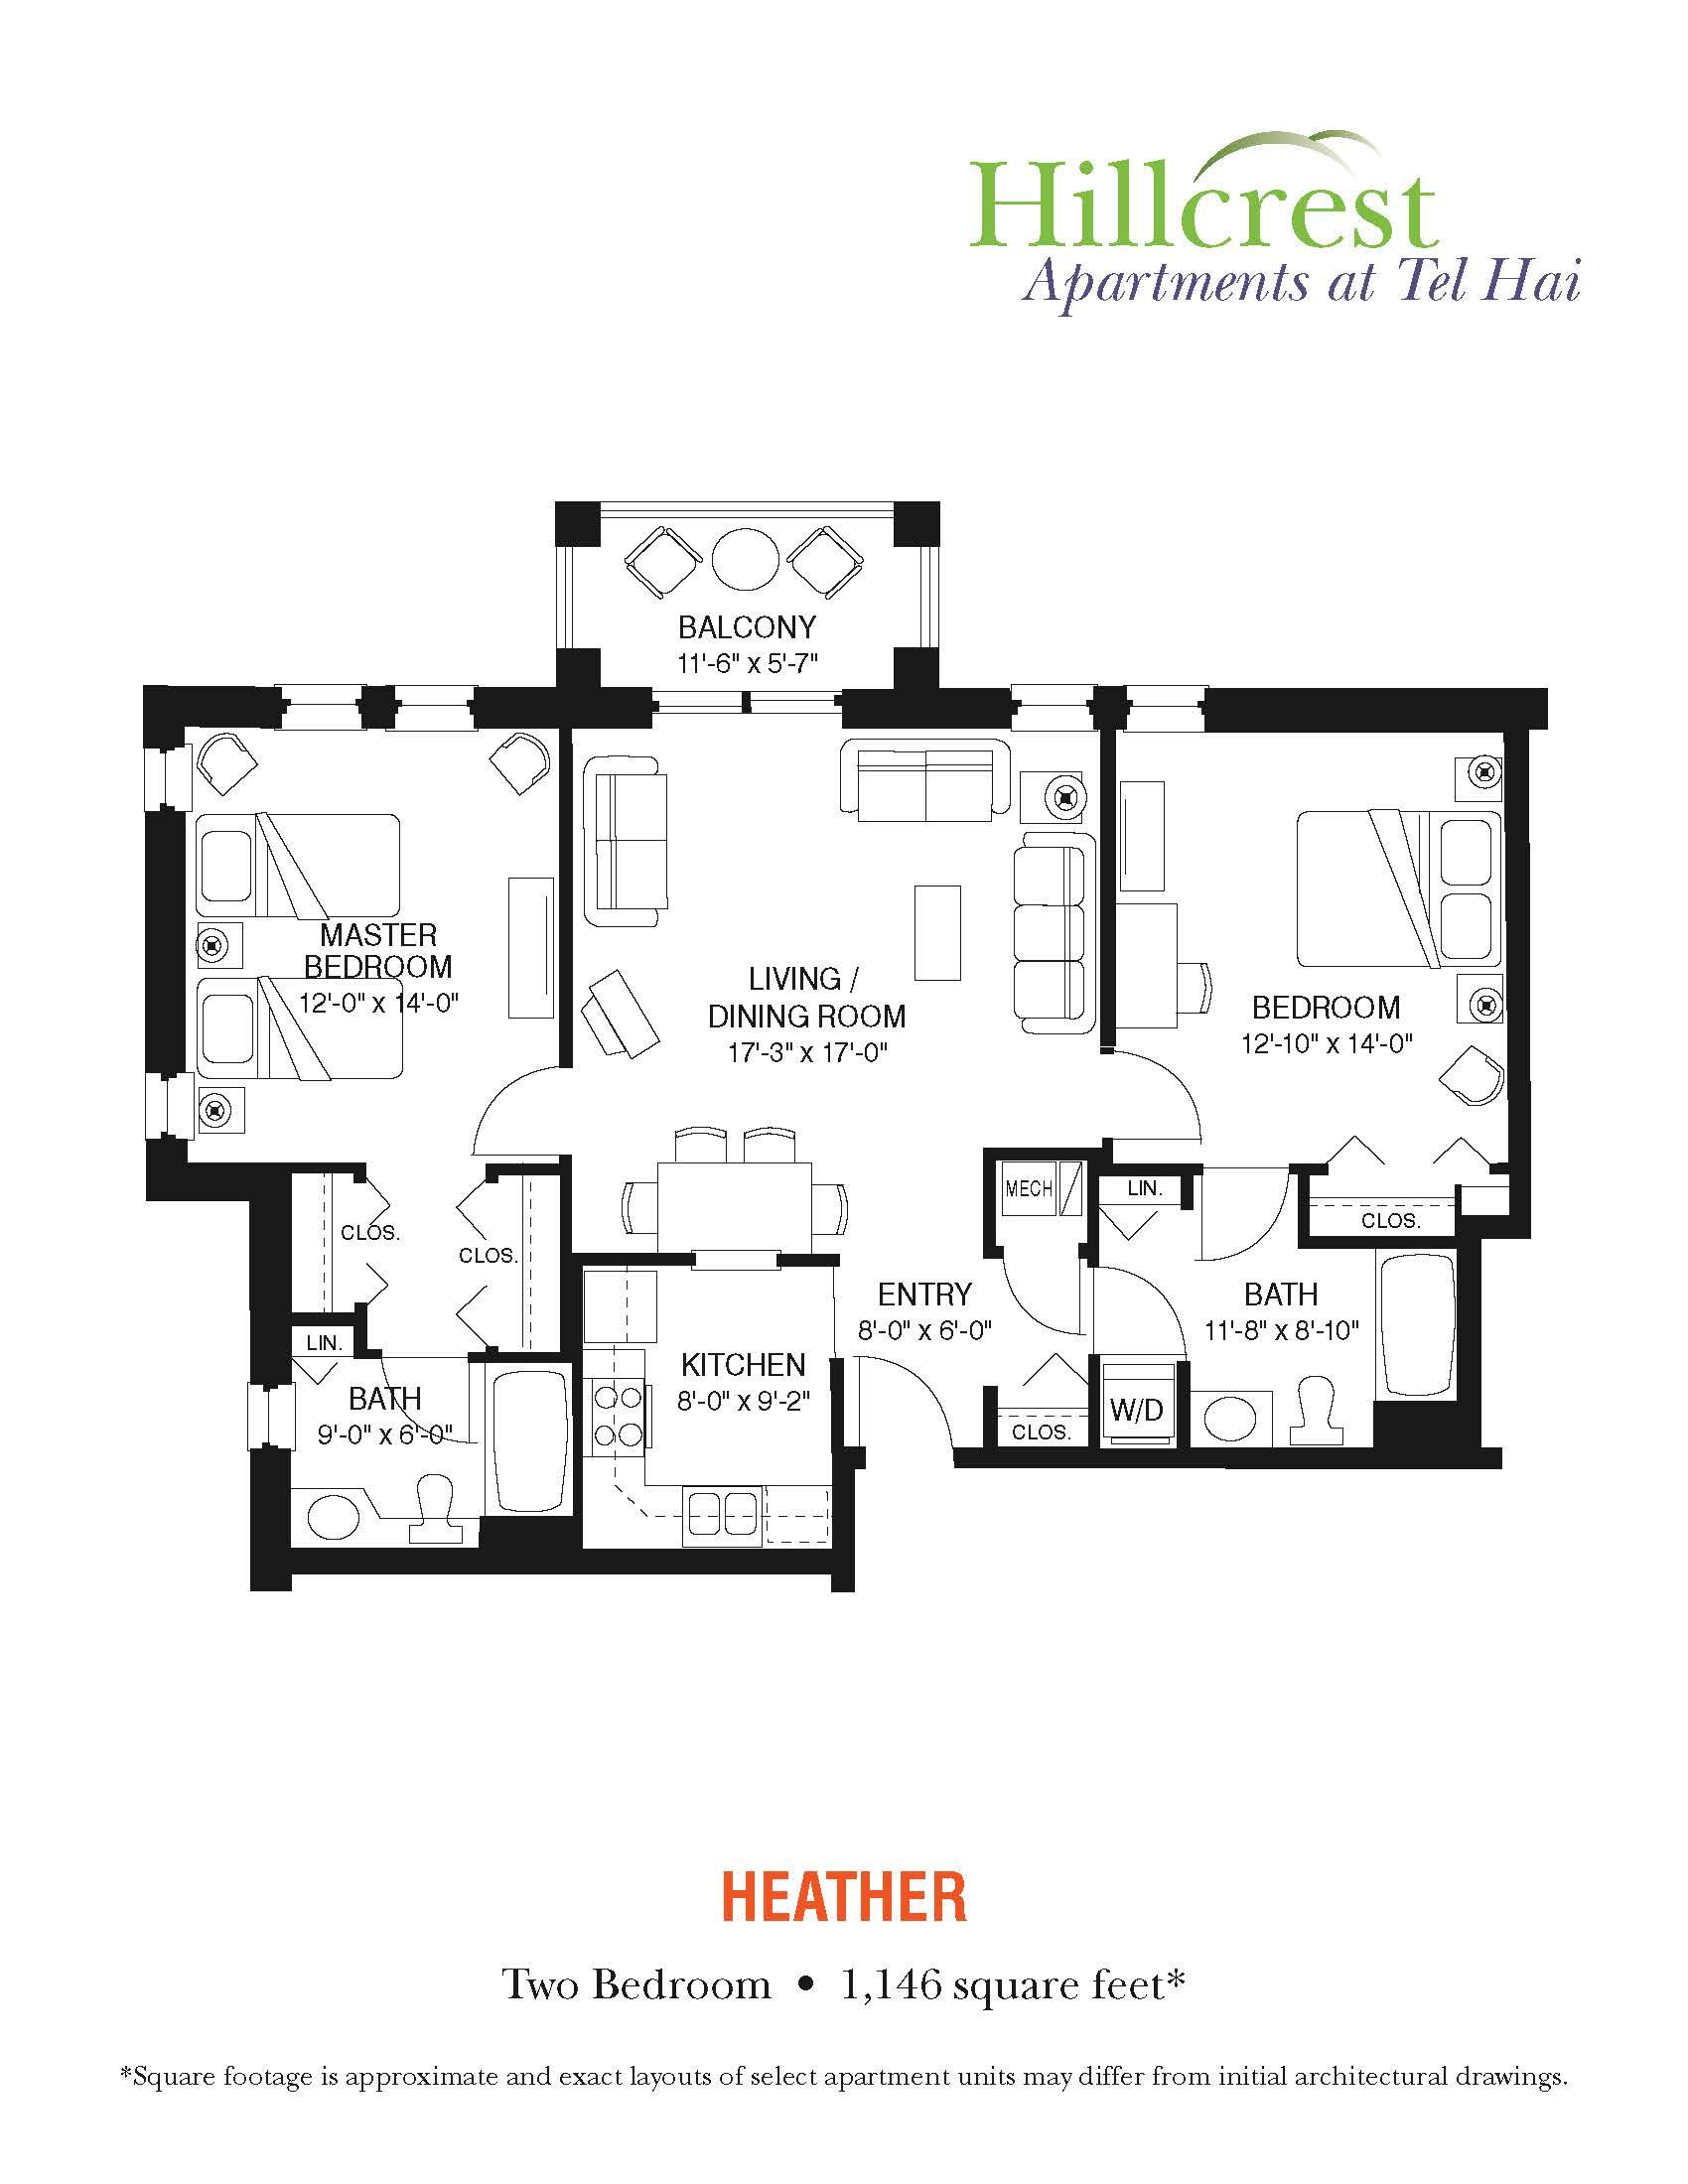 Heather Apartment at Tel Hai